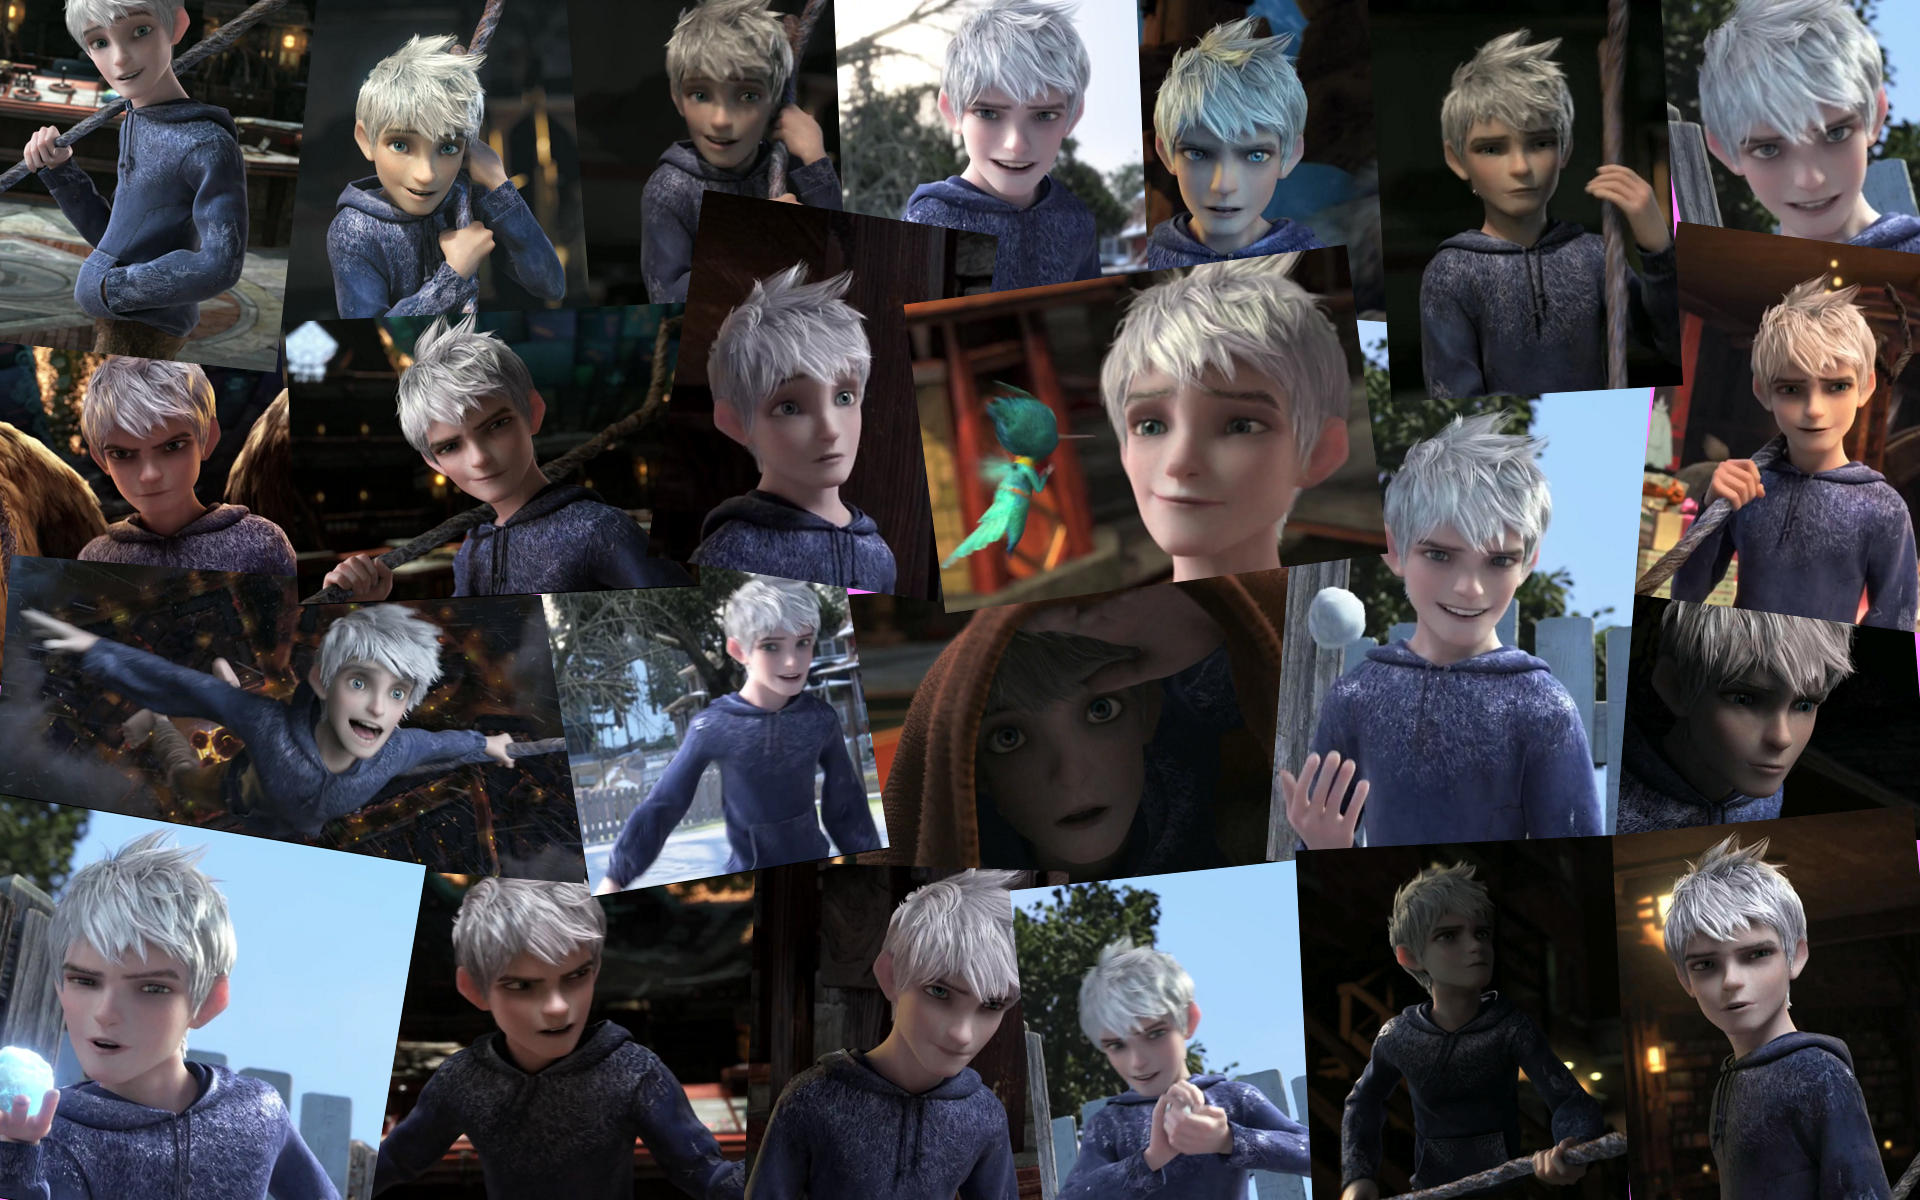 Jack Frost Collage by kaoru-reisaki